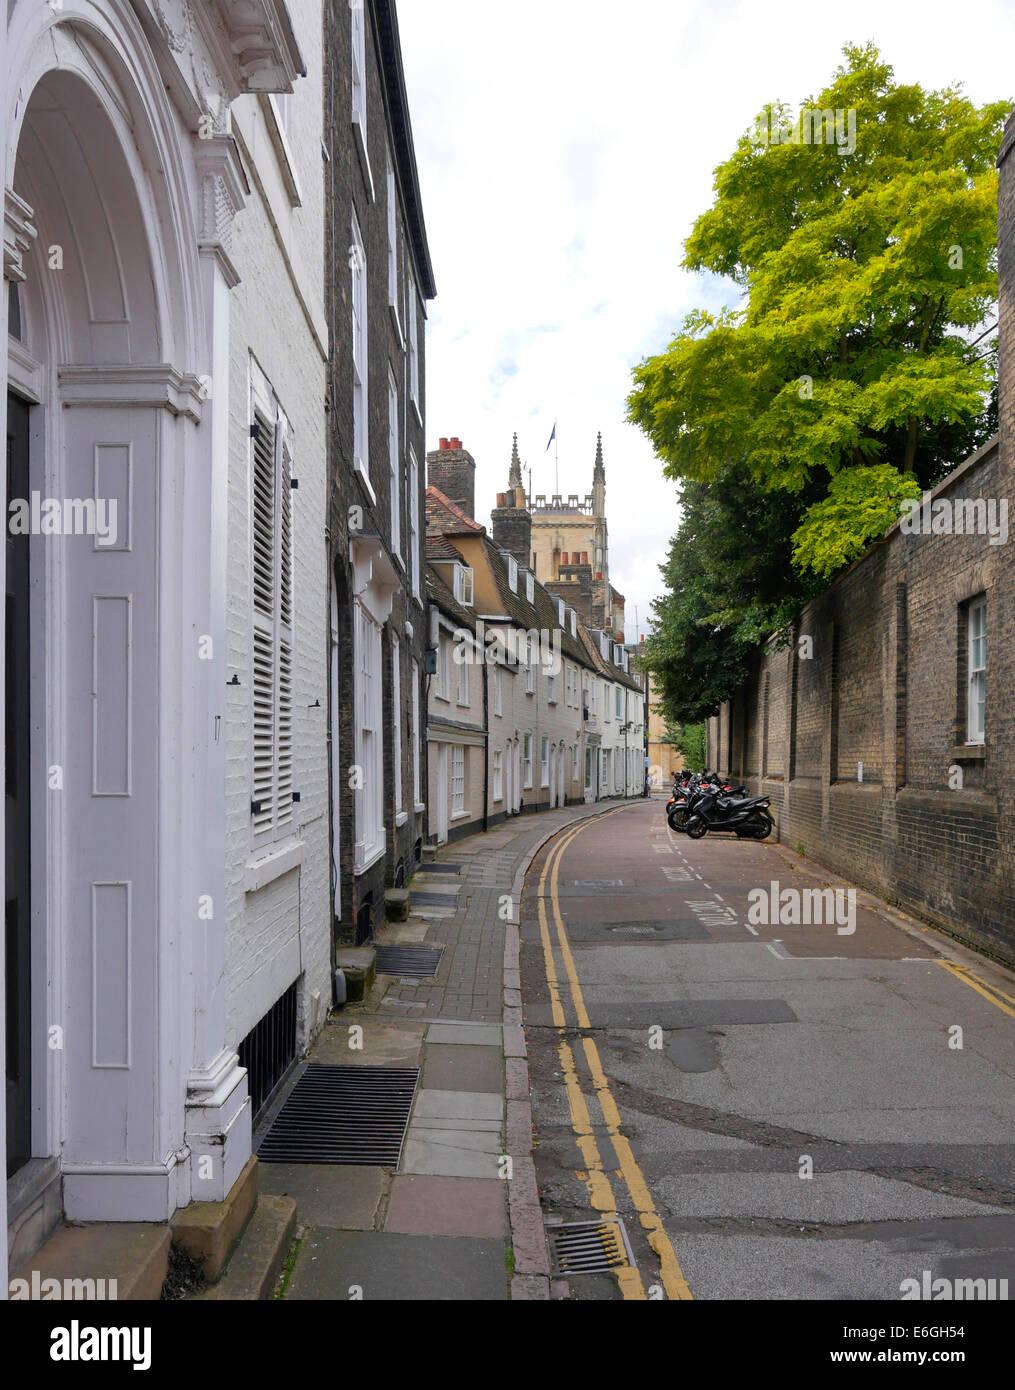 Boltoph Lane period housing and narrow street, Cambridge, England - Stock Image